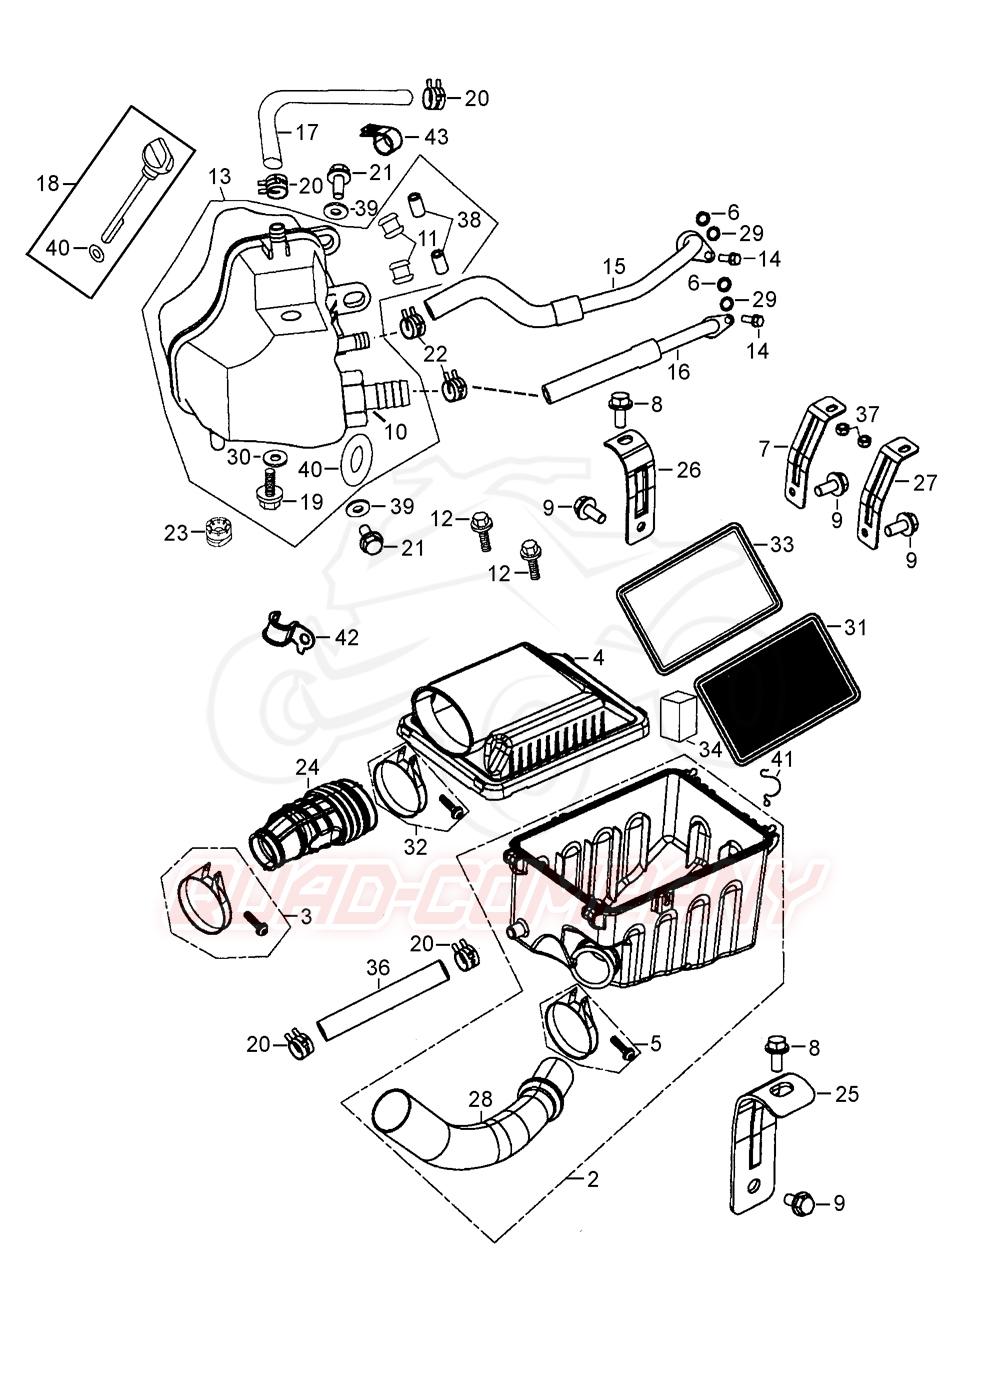 beeline bestia 5 5 onroad lof luftfilter ltank ersatzteile. Black Bedroom Furniture Sets. Home Design Ideas